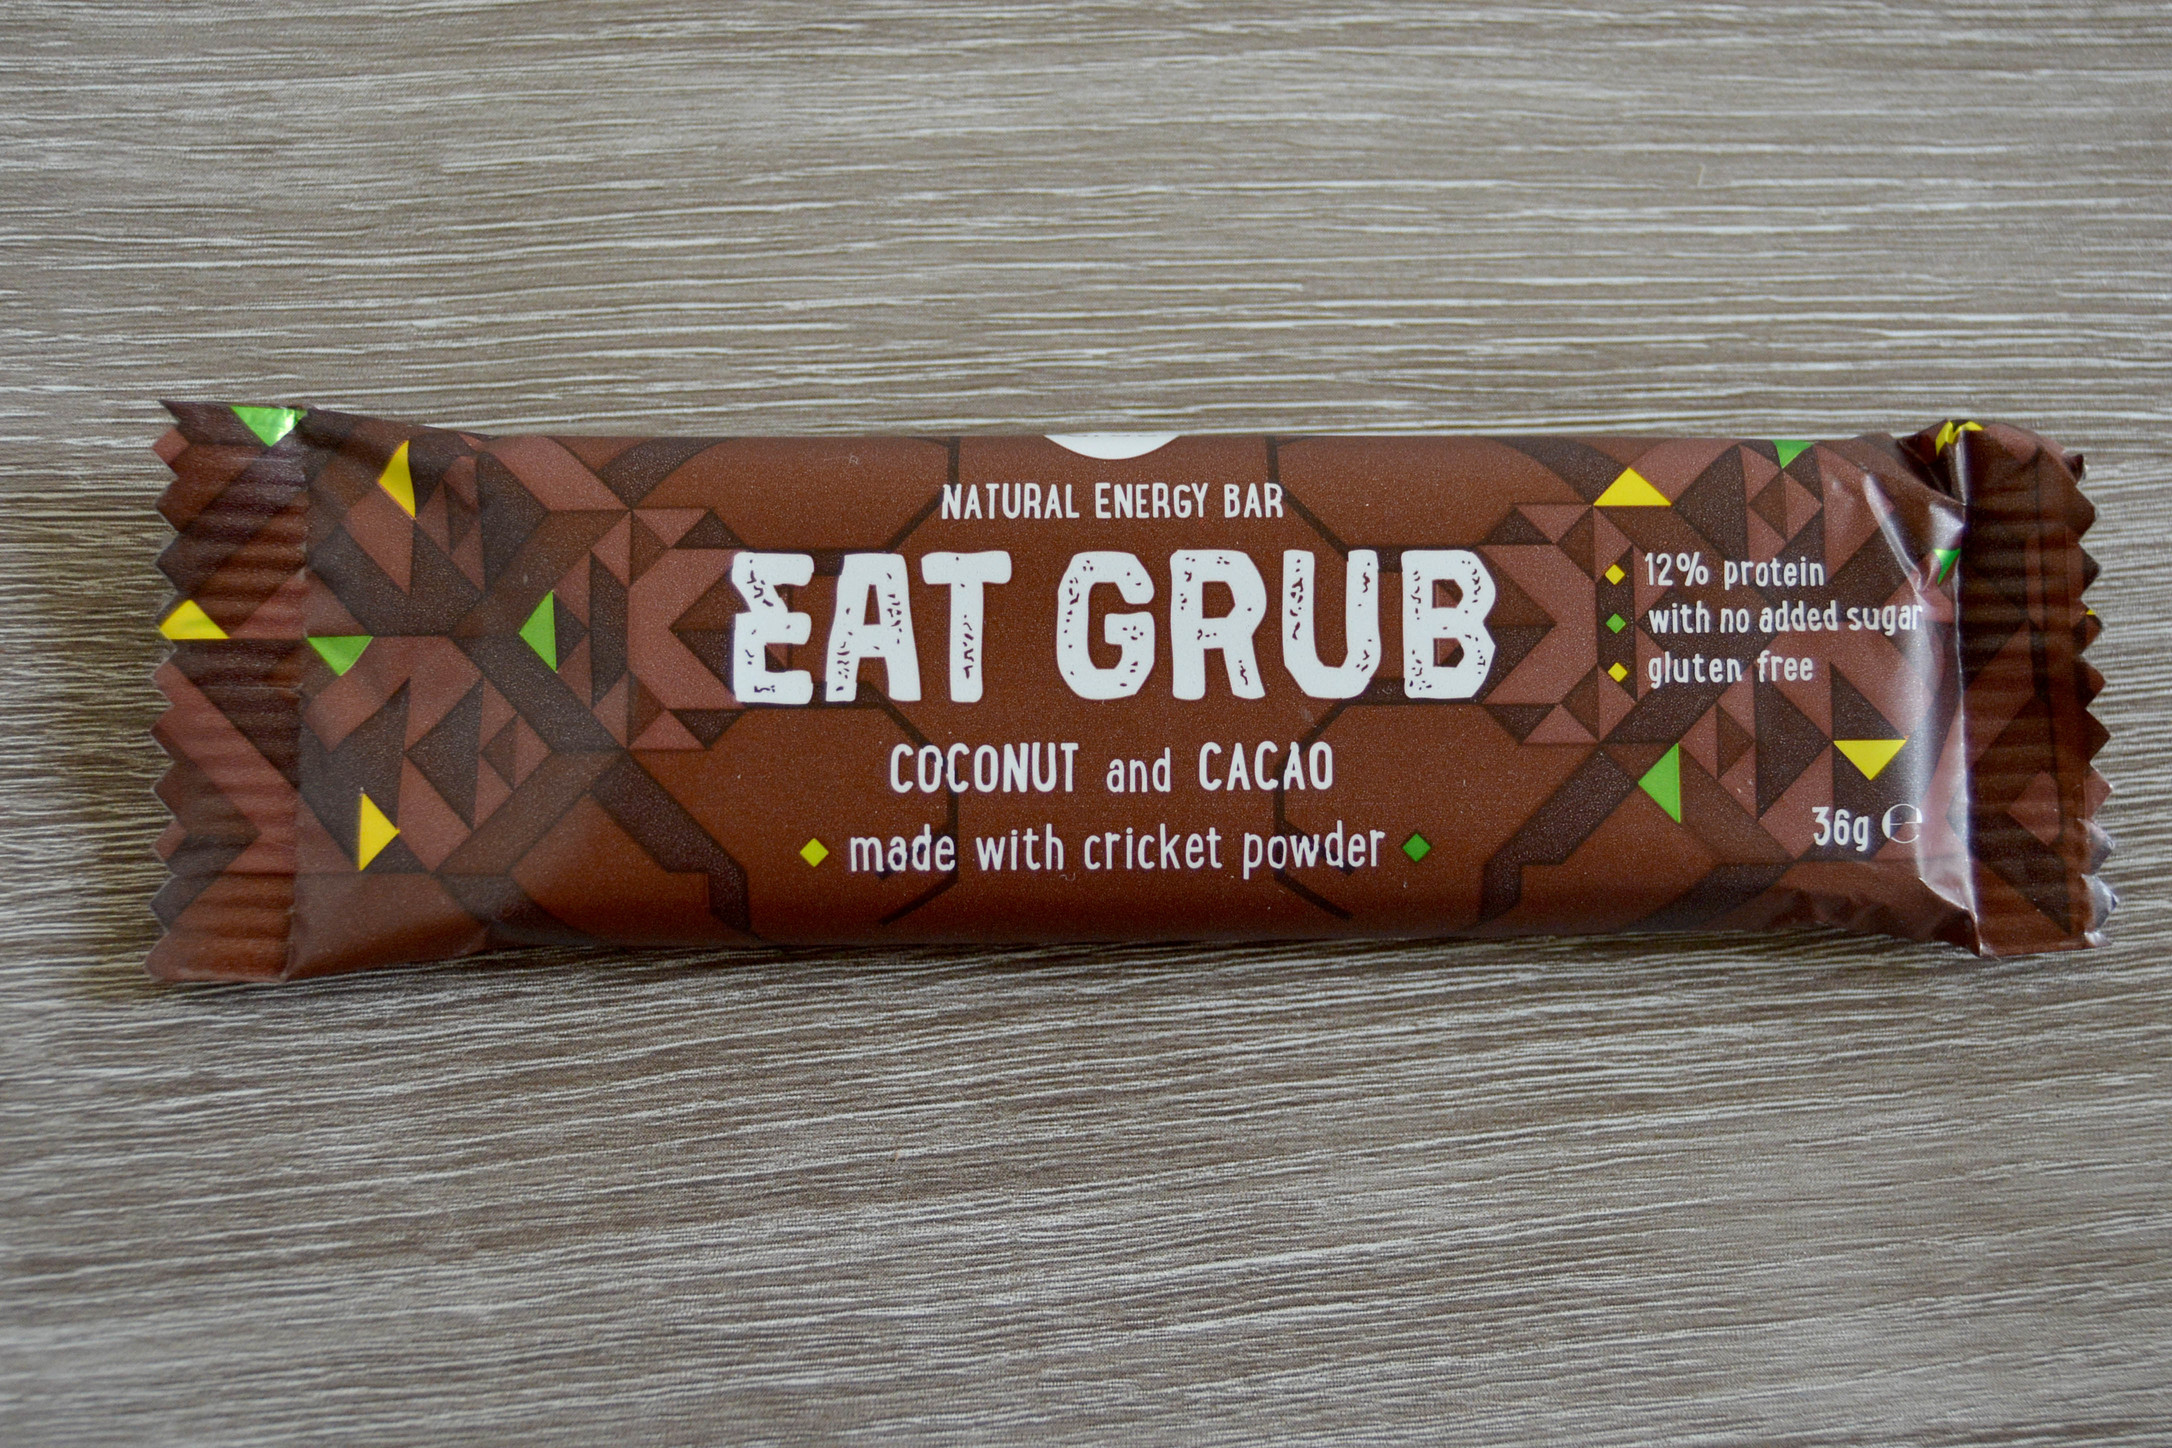 eat-grub